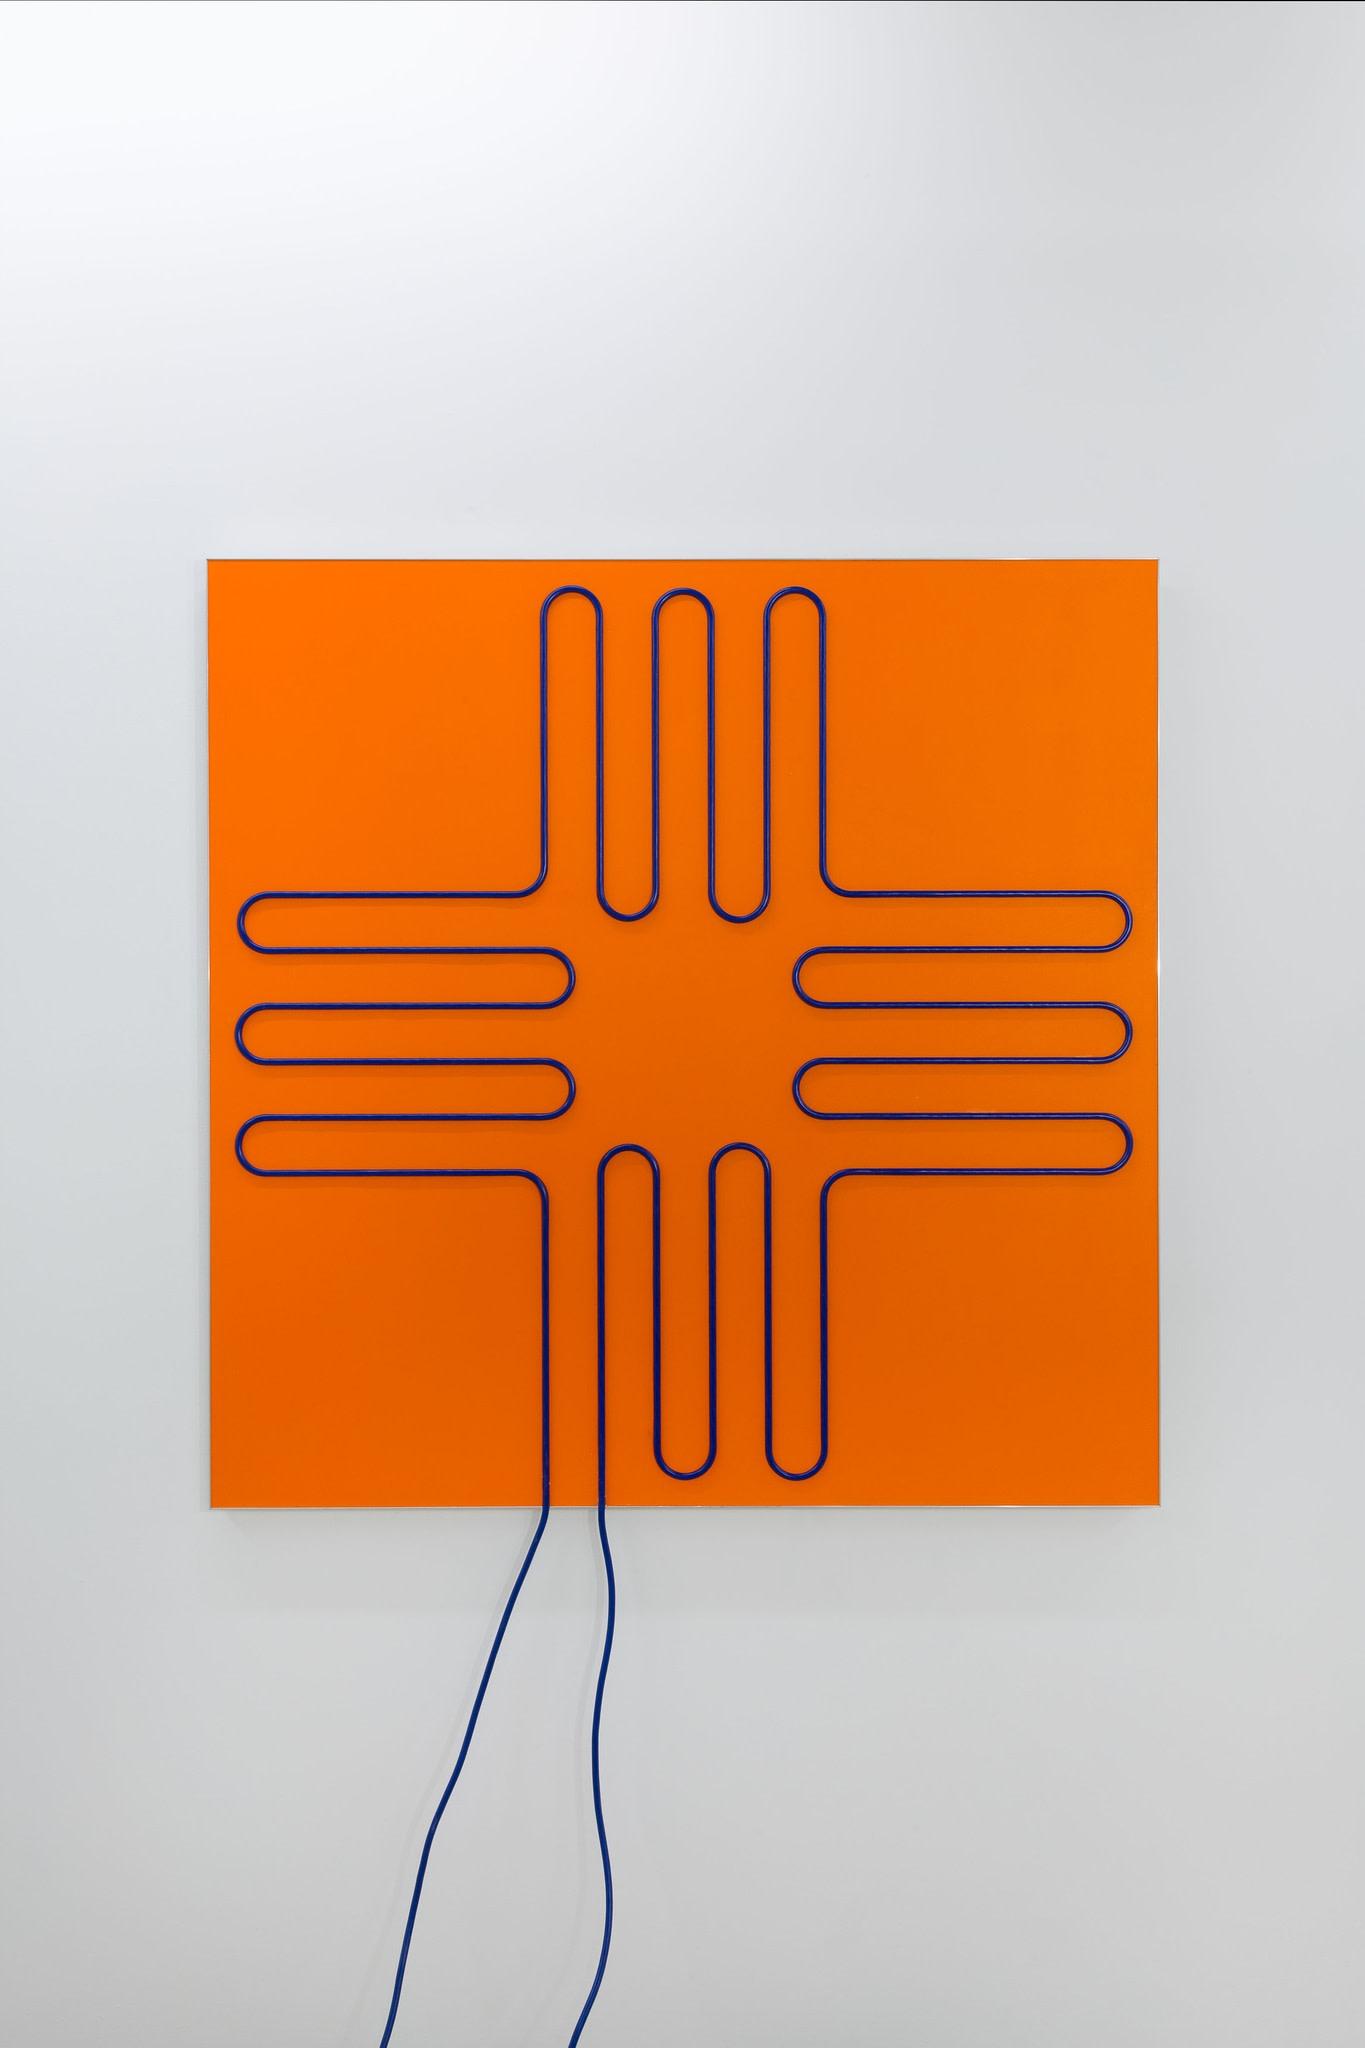 <span class=&#34;link fancybox-details-link&#34;><a href=&#34;/artists/44-jacob-dahlgren/works/8762/&#34;>View Detail Page</a></span><div class=&#34;artist&#34;><strong>Jacob Dahlgren</strong></div> <div class=&#34;title&#34;><em>Third Uncle #7</em>, 2015</div> <div class=&#34;medium&#34;>MDF, acrylic paint, electrical cable, aluminium</div> <div class=&#34;dimensions&#34;>110 x 110 cm<br />43 1/4 x 43 1/4 in</div><div class=&#34;copyright_line&#34;>Copyright The Artist</div>